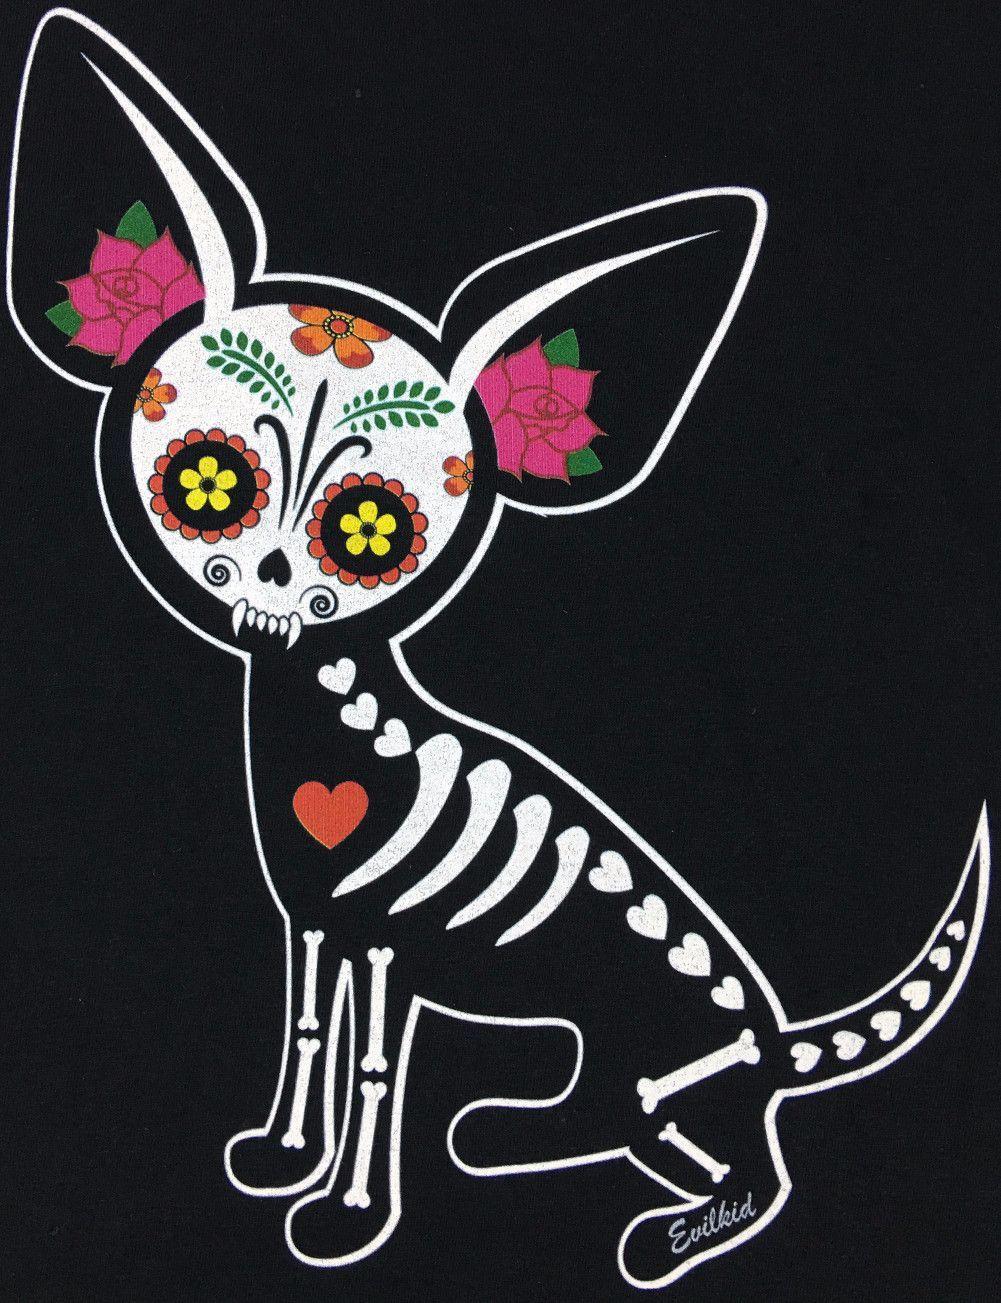 77e2fad3 Evilkid Chihuahua Muerta Sugar Skull Skeleton Dog Men's T-Shirt ...